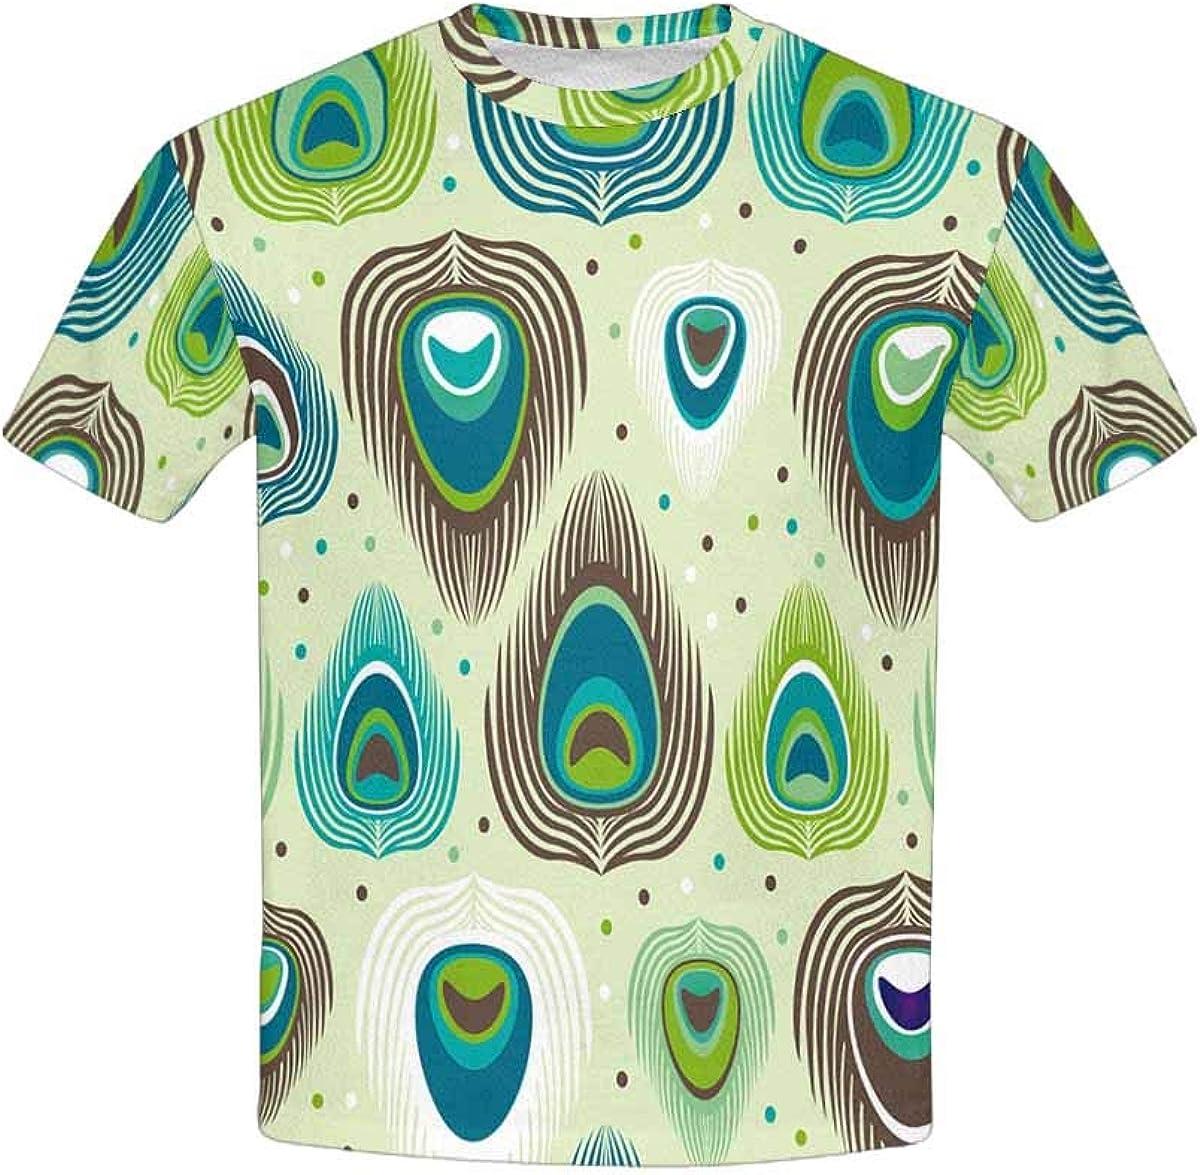 INTERESTPRINT Kids T-Shirts Cool Dinosaur XS-XL